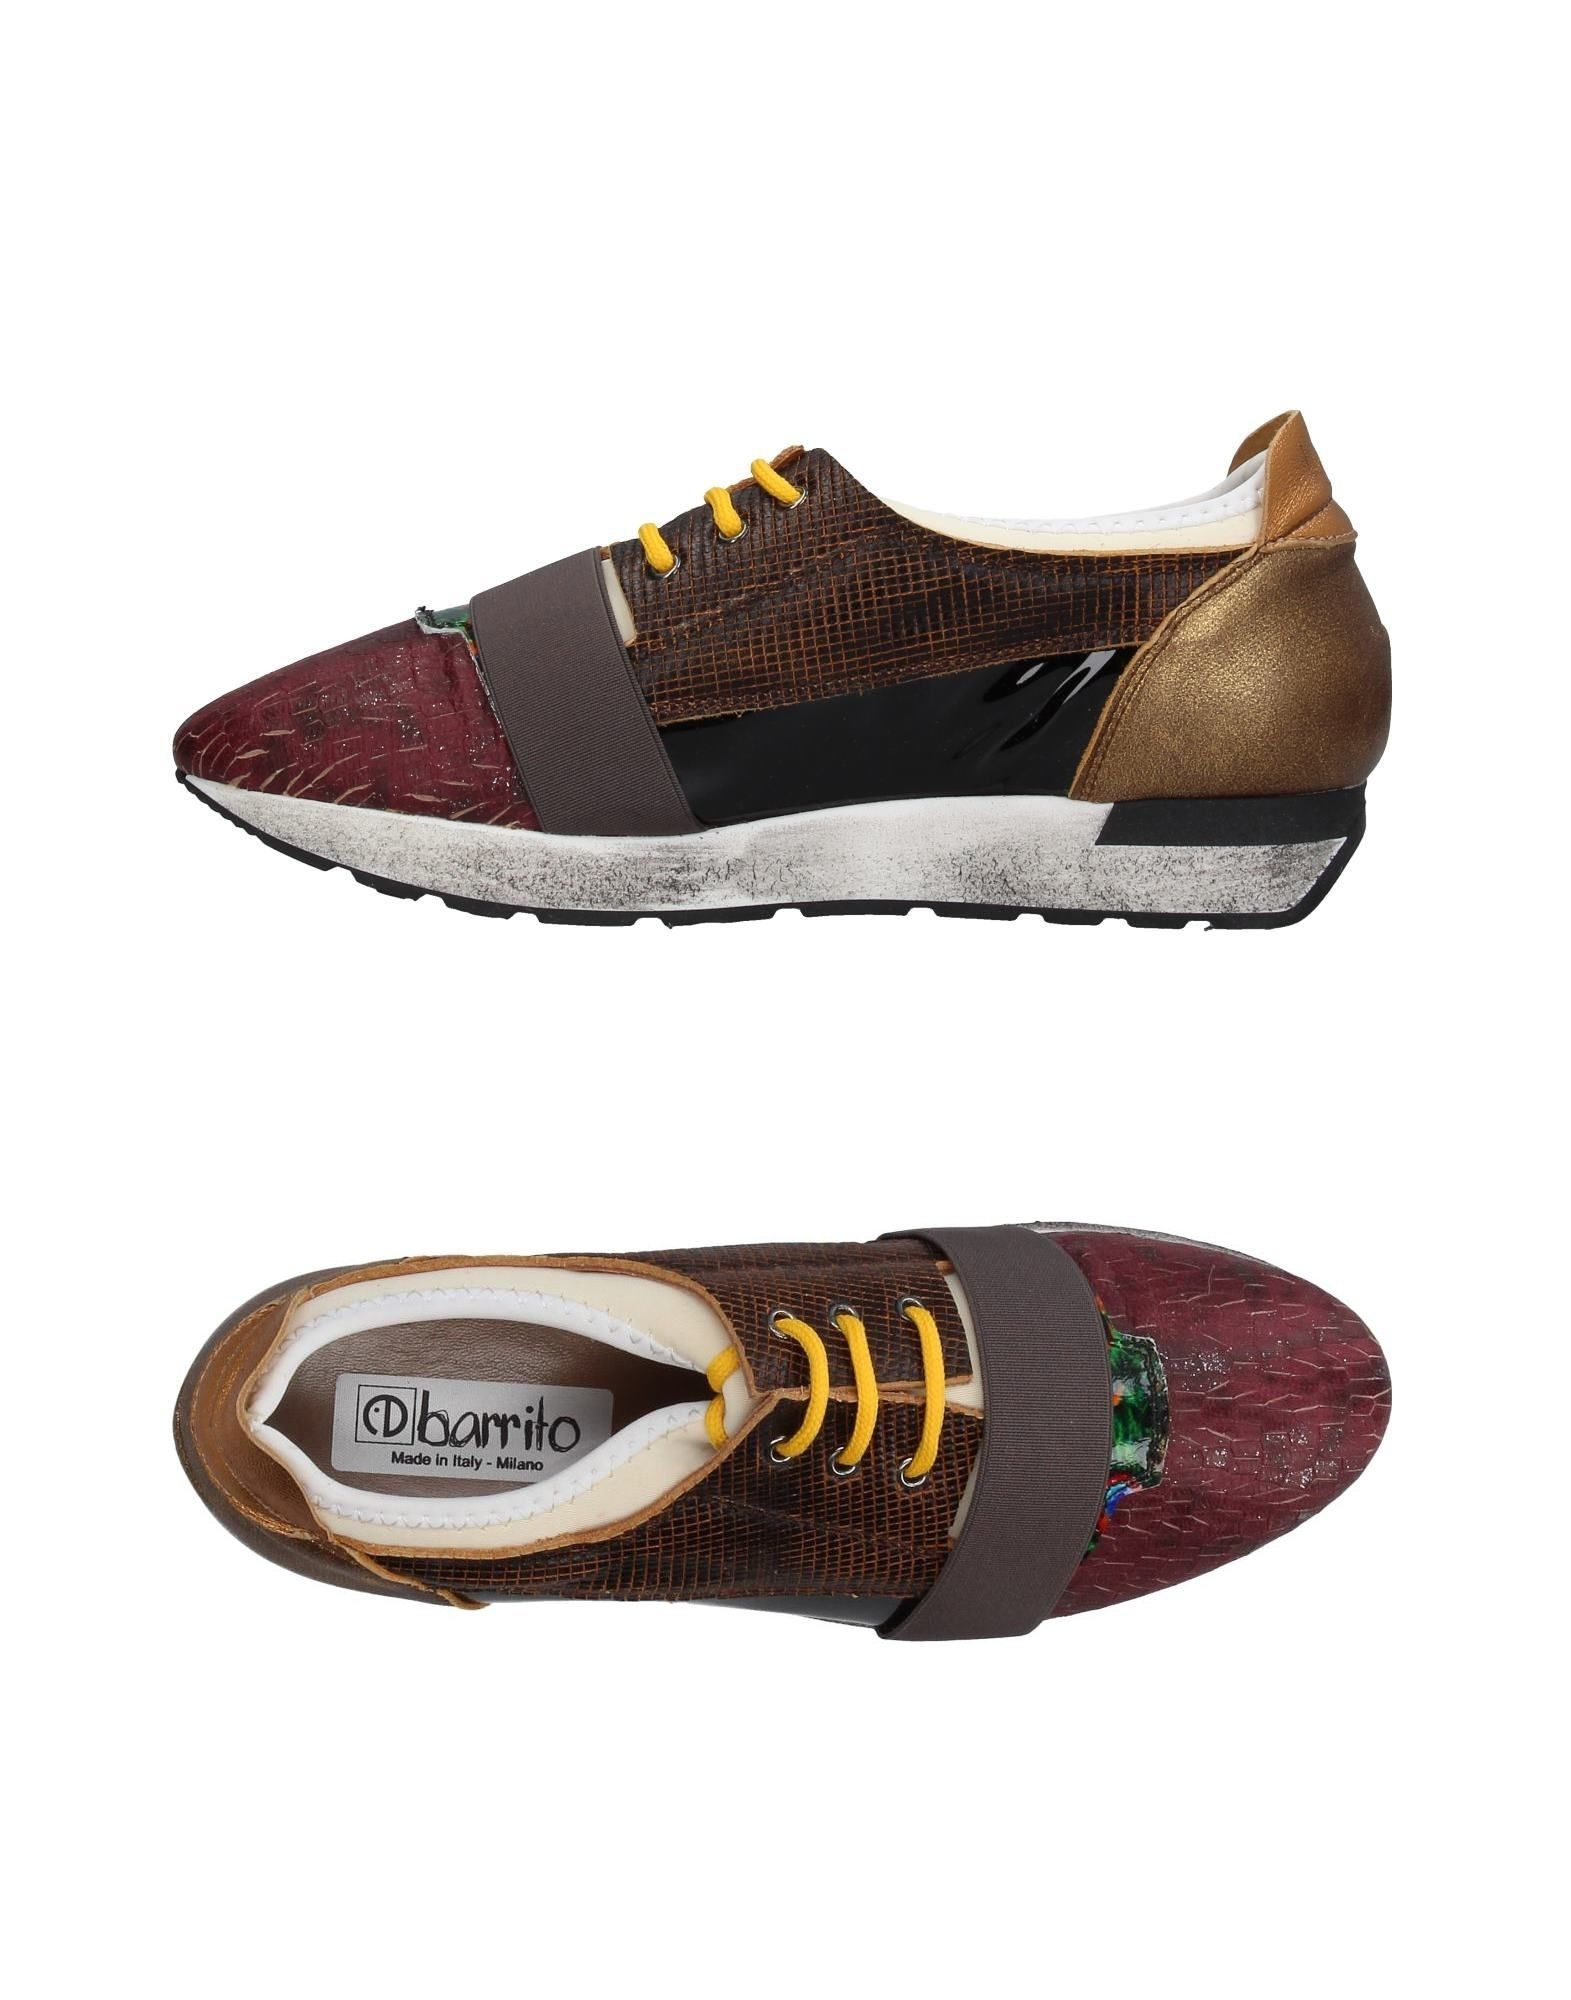 Ebarrito Gute Sneakers Damen 11396437KD Gute Ebarrito Qualität beliebte  Schuhe 195baa 681ef602ee